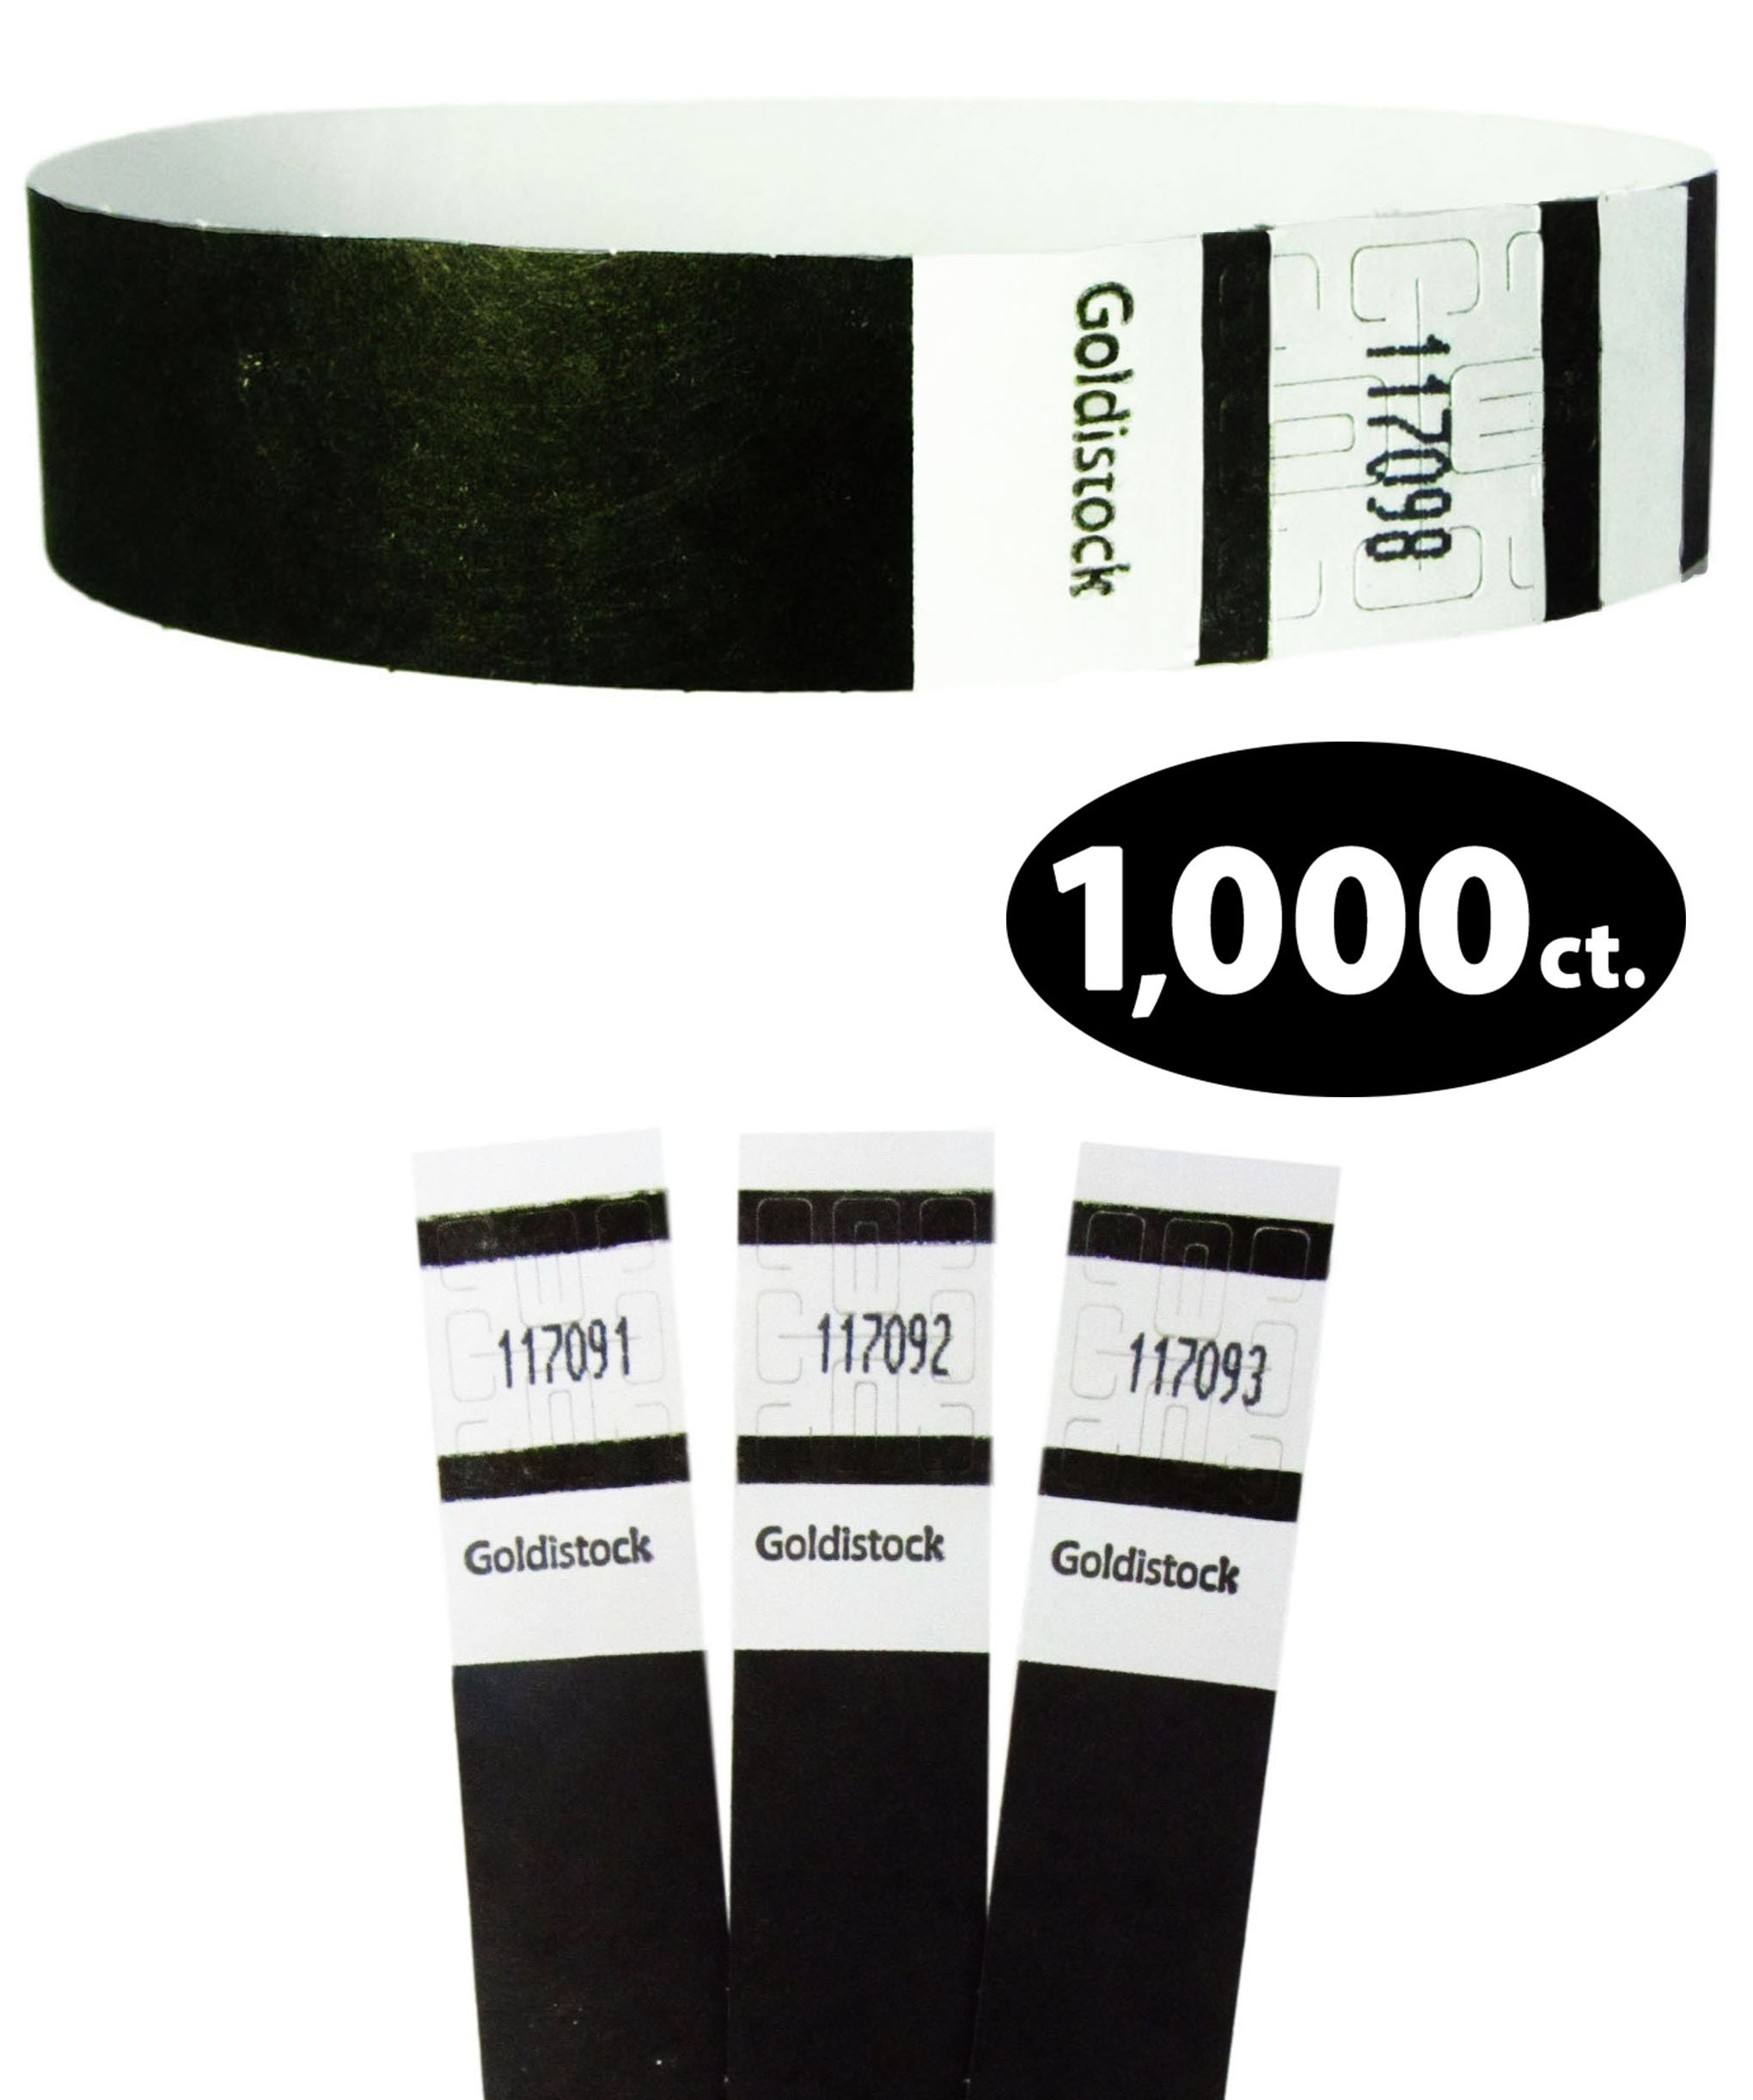 Goldistock Original Series - 3/4'' Tyvek Wristbands Tuxedo Black 1,000 Count Value Pack - Event Identification Bands (Paper - Like Texture)